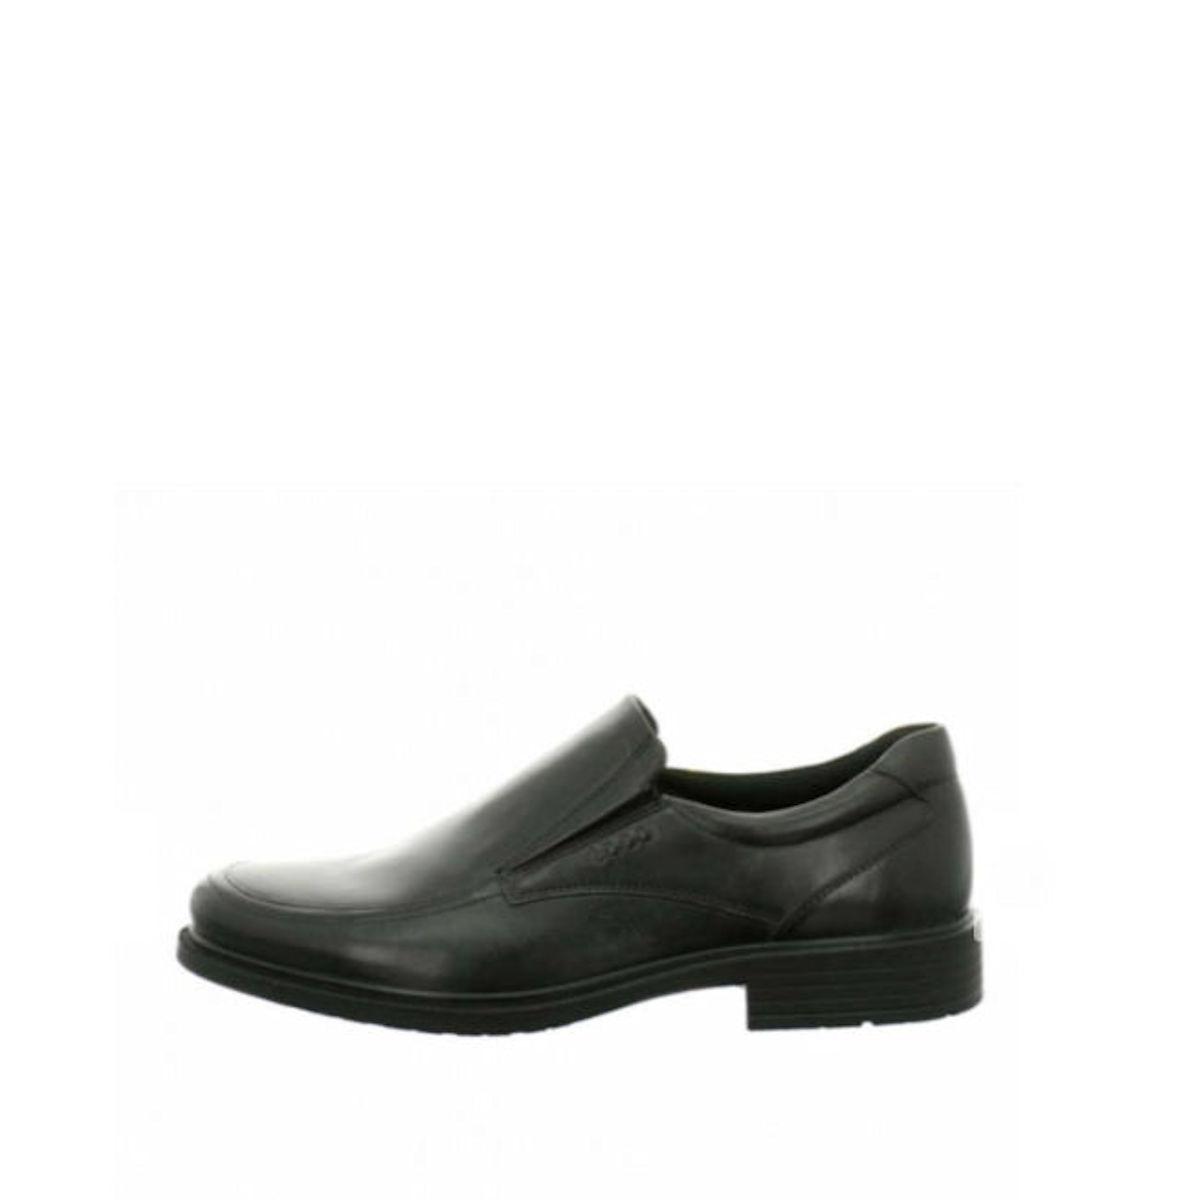 ECCO 610614 - Mens Classic Slip-On Black Inglewood Shoe